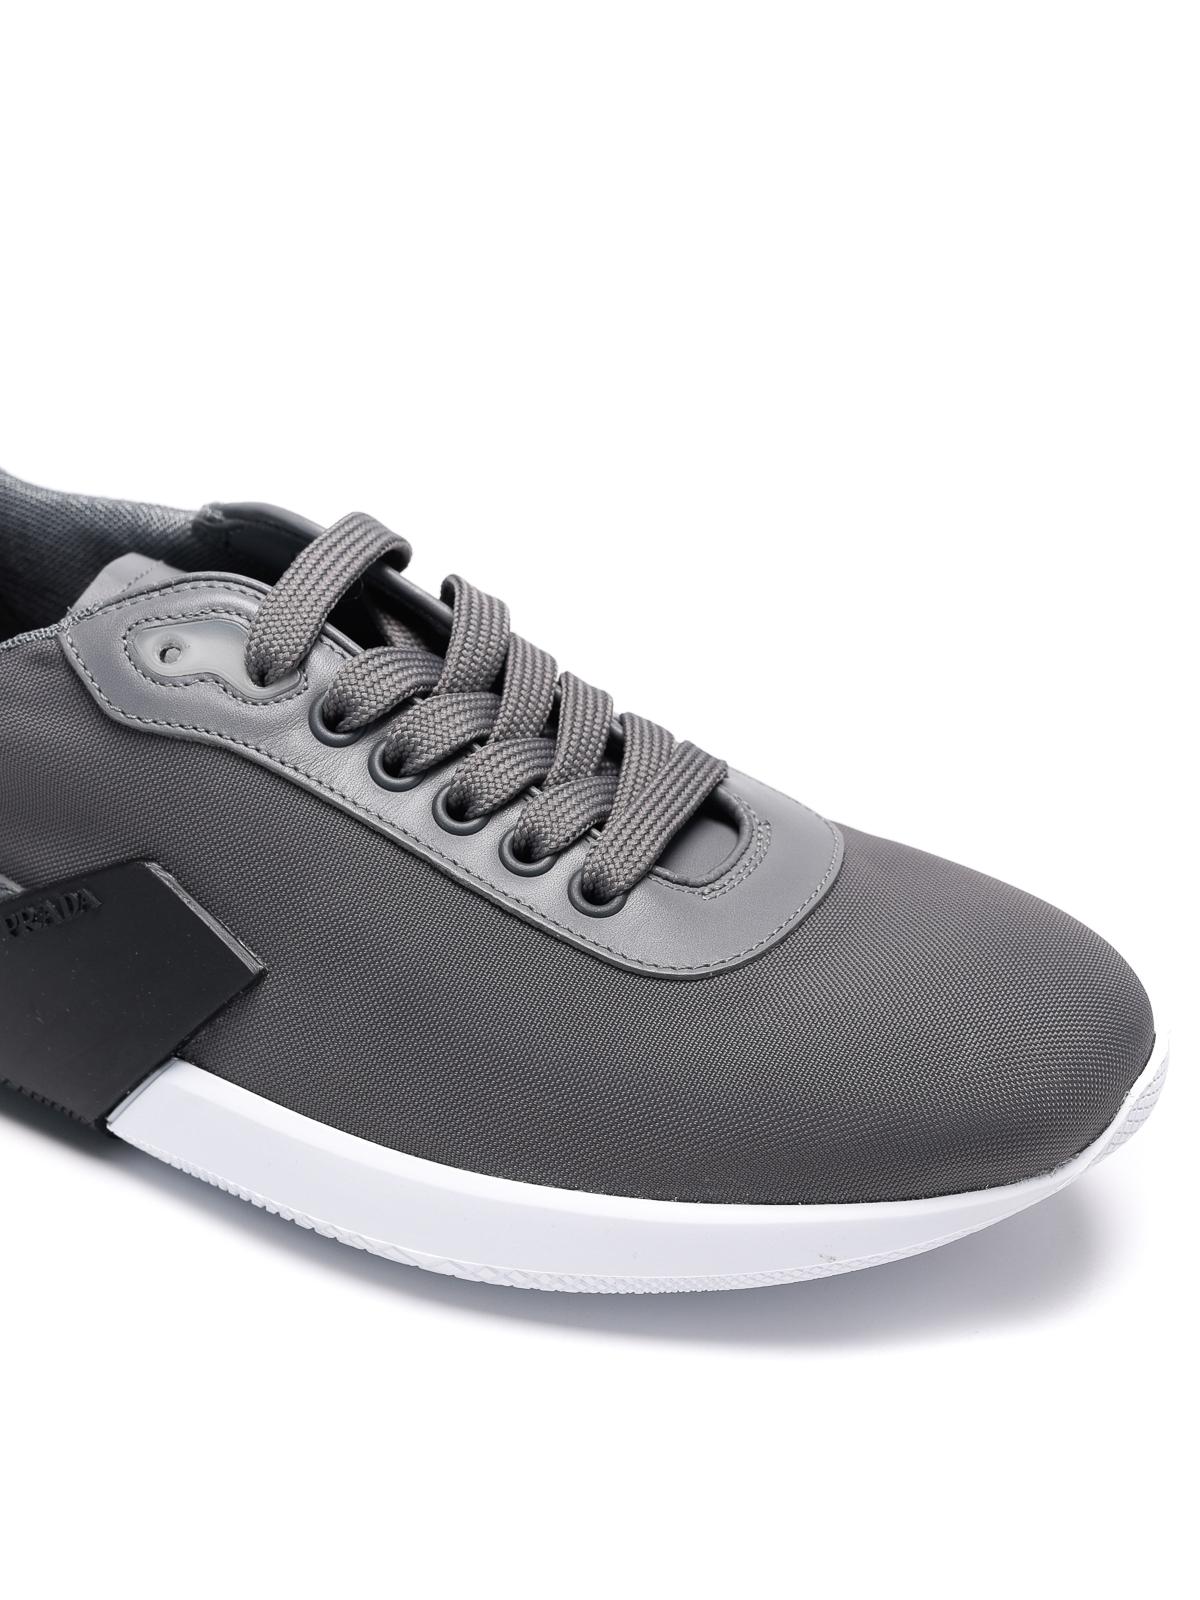 Prada Linea Rossa - Nylon tech sneakers